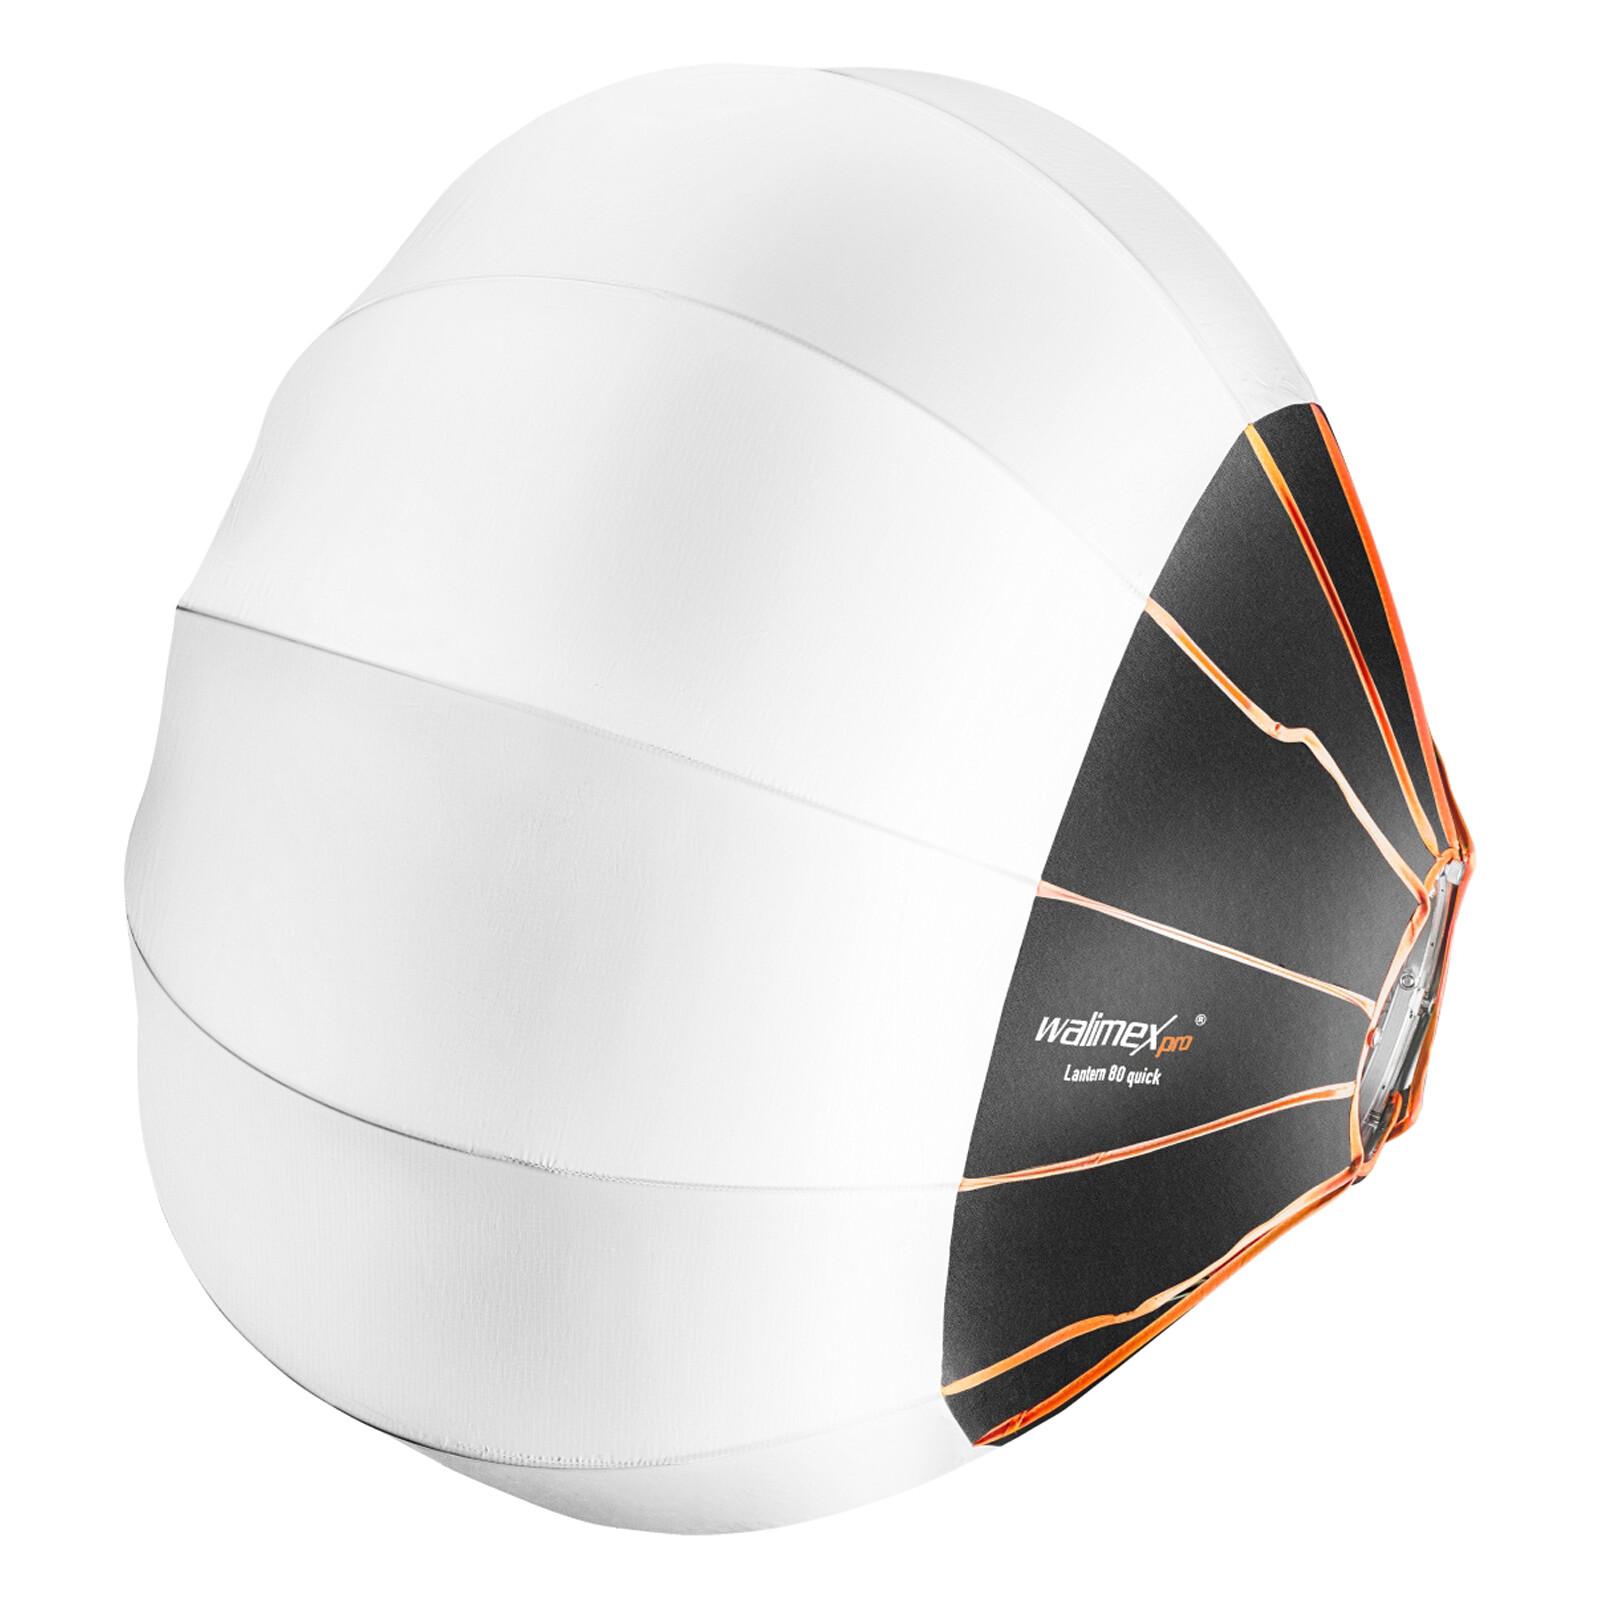 Walimex pro 360° Ambient Light Softbox 80cm Profoto